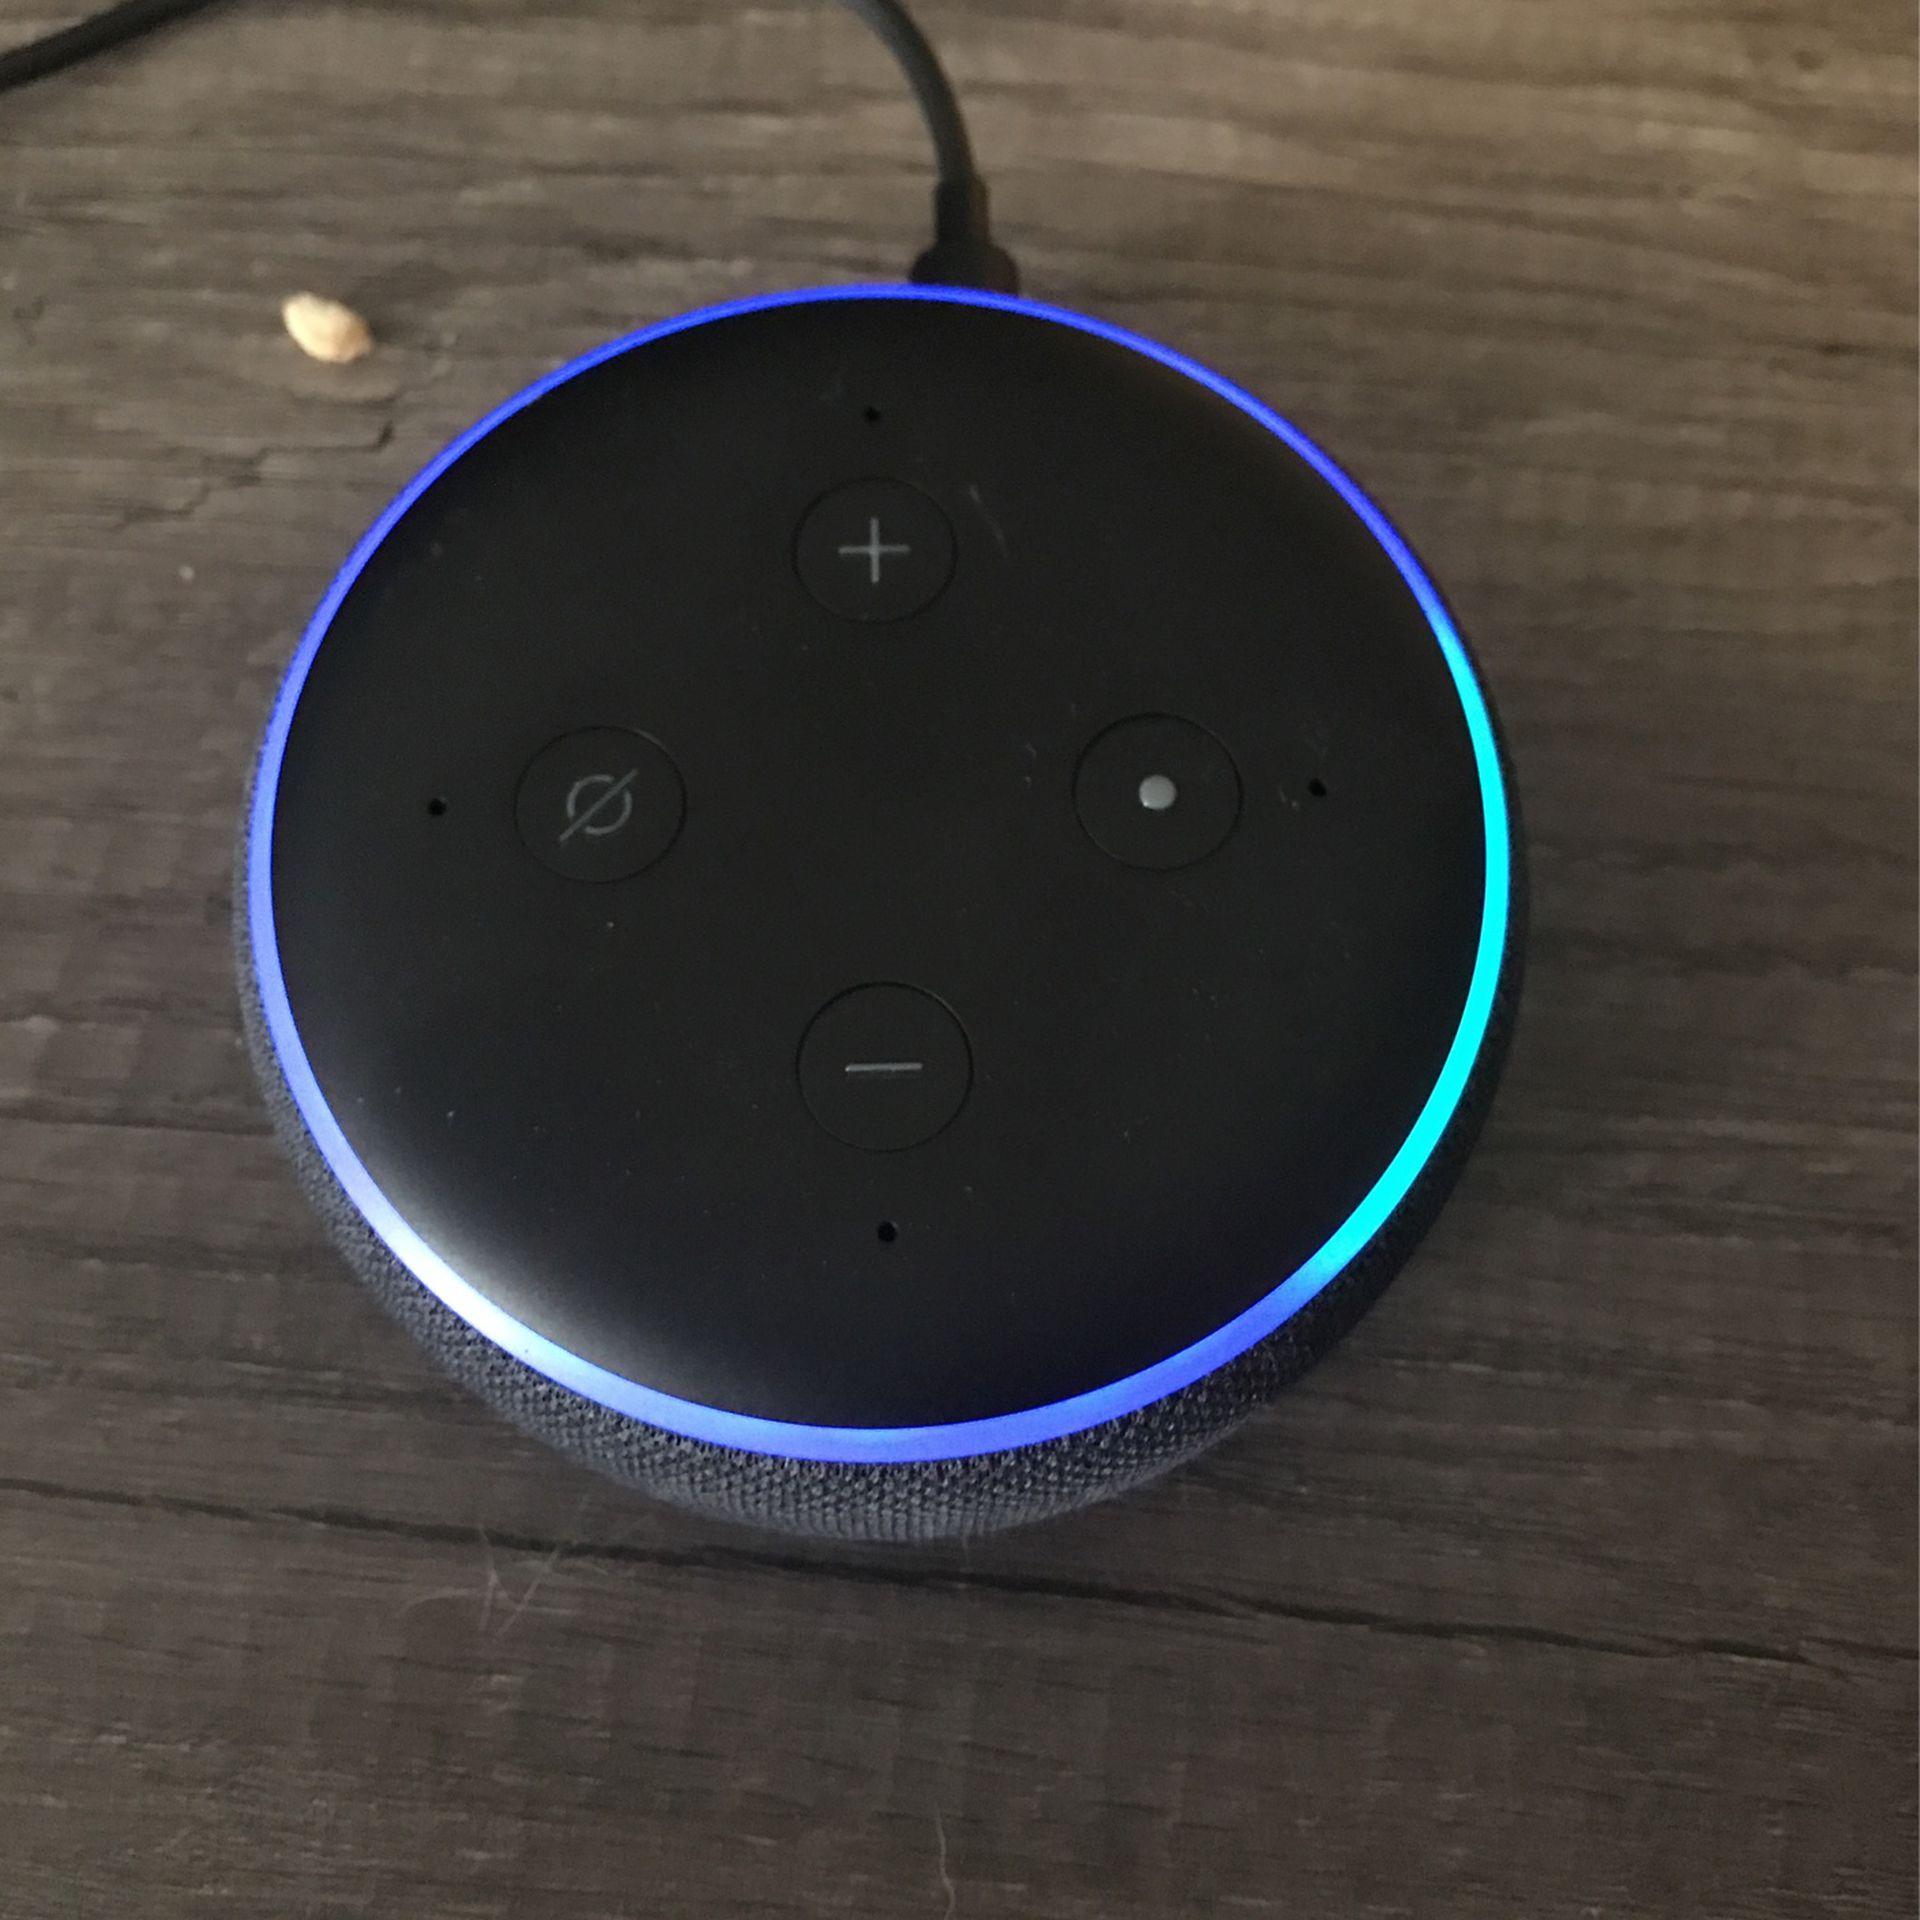 Amazon Echo Dot Gen 3